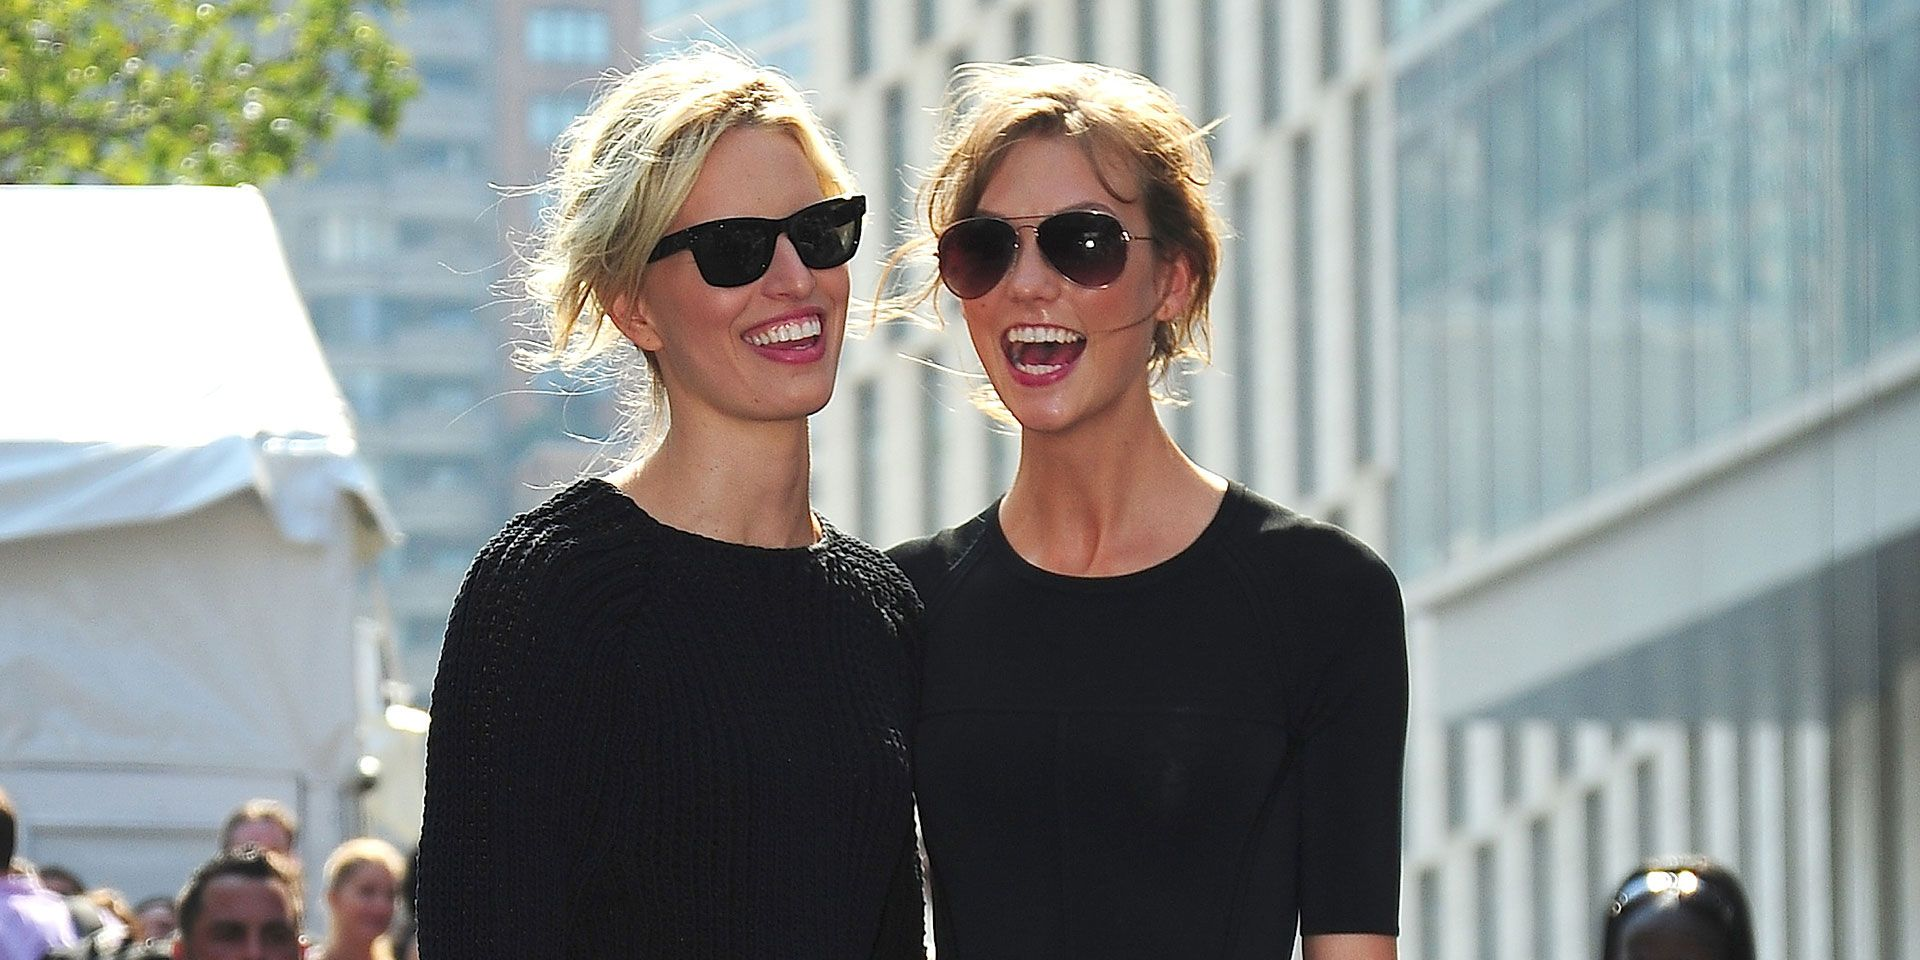 Front Row at NYC Spring 2014 Fashion Week